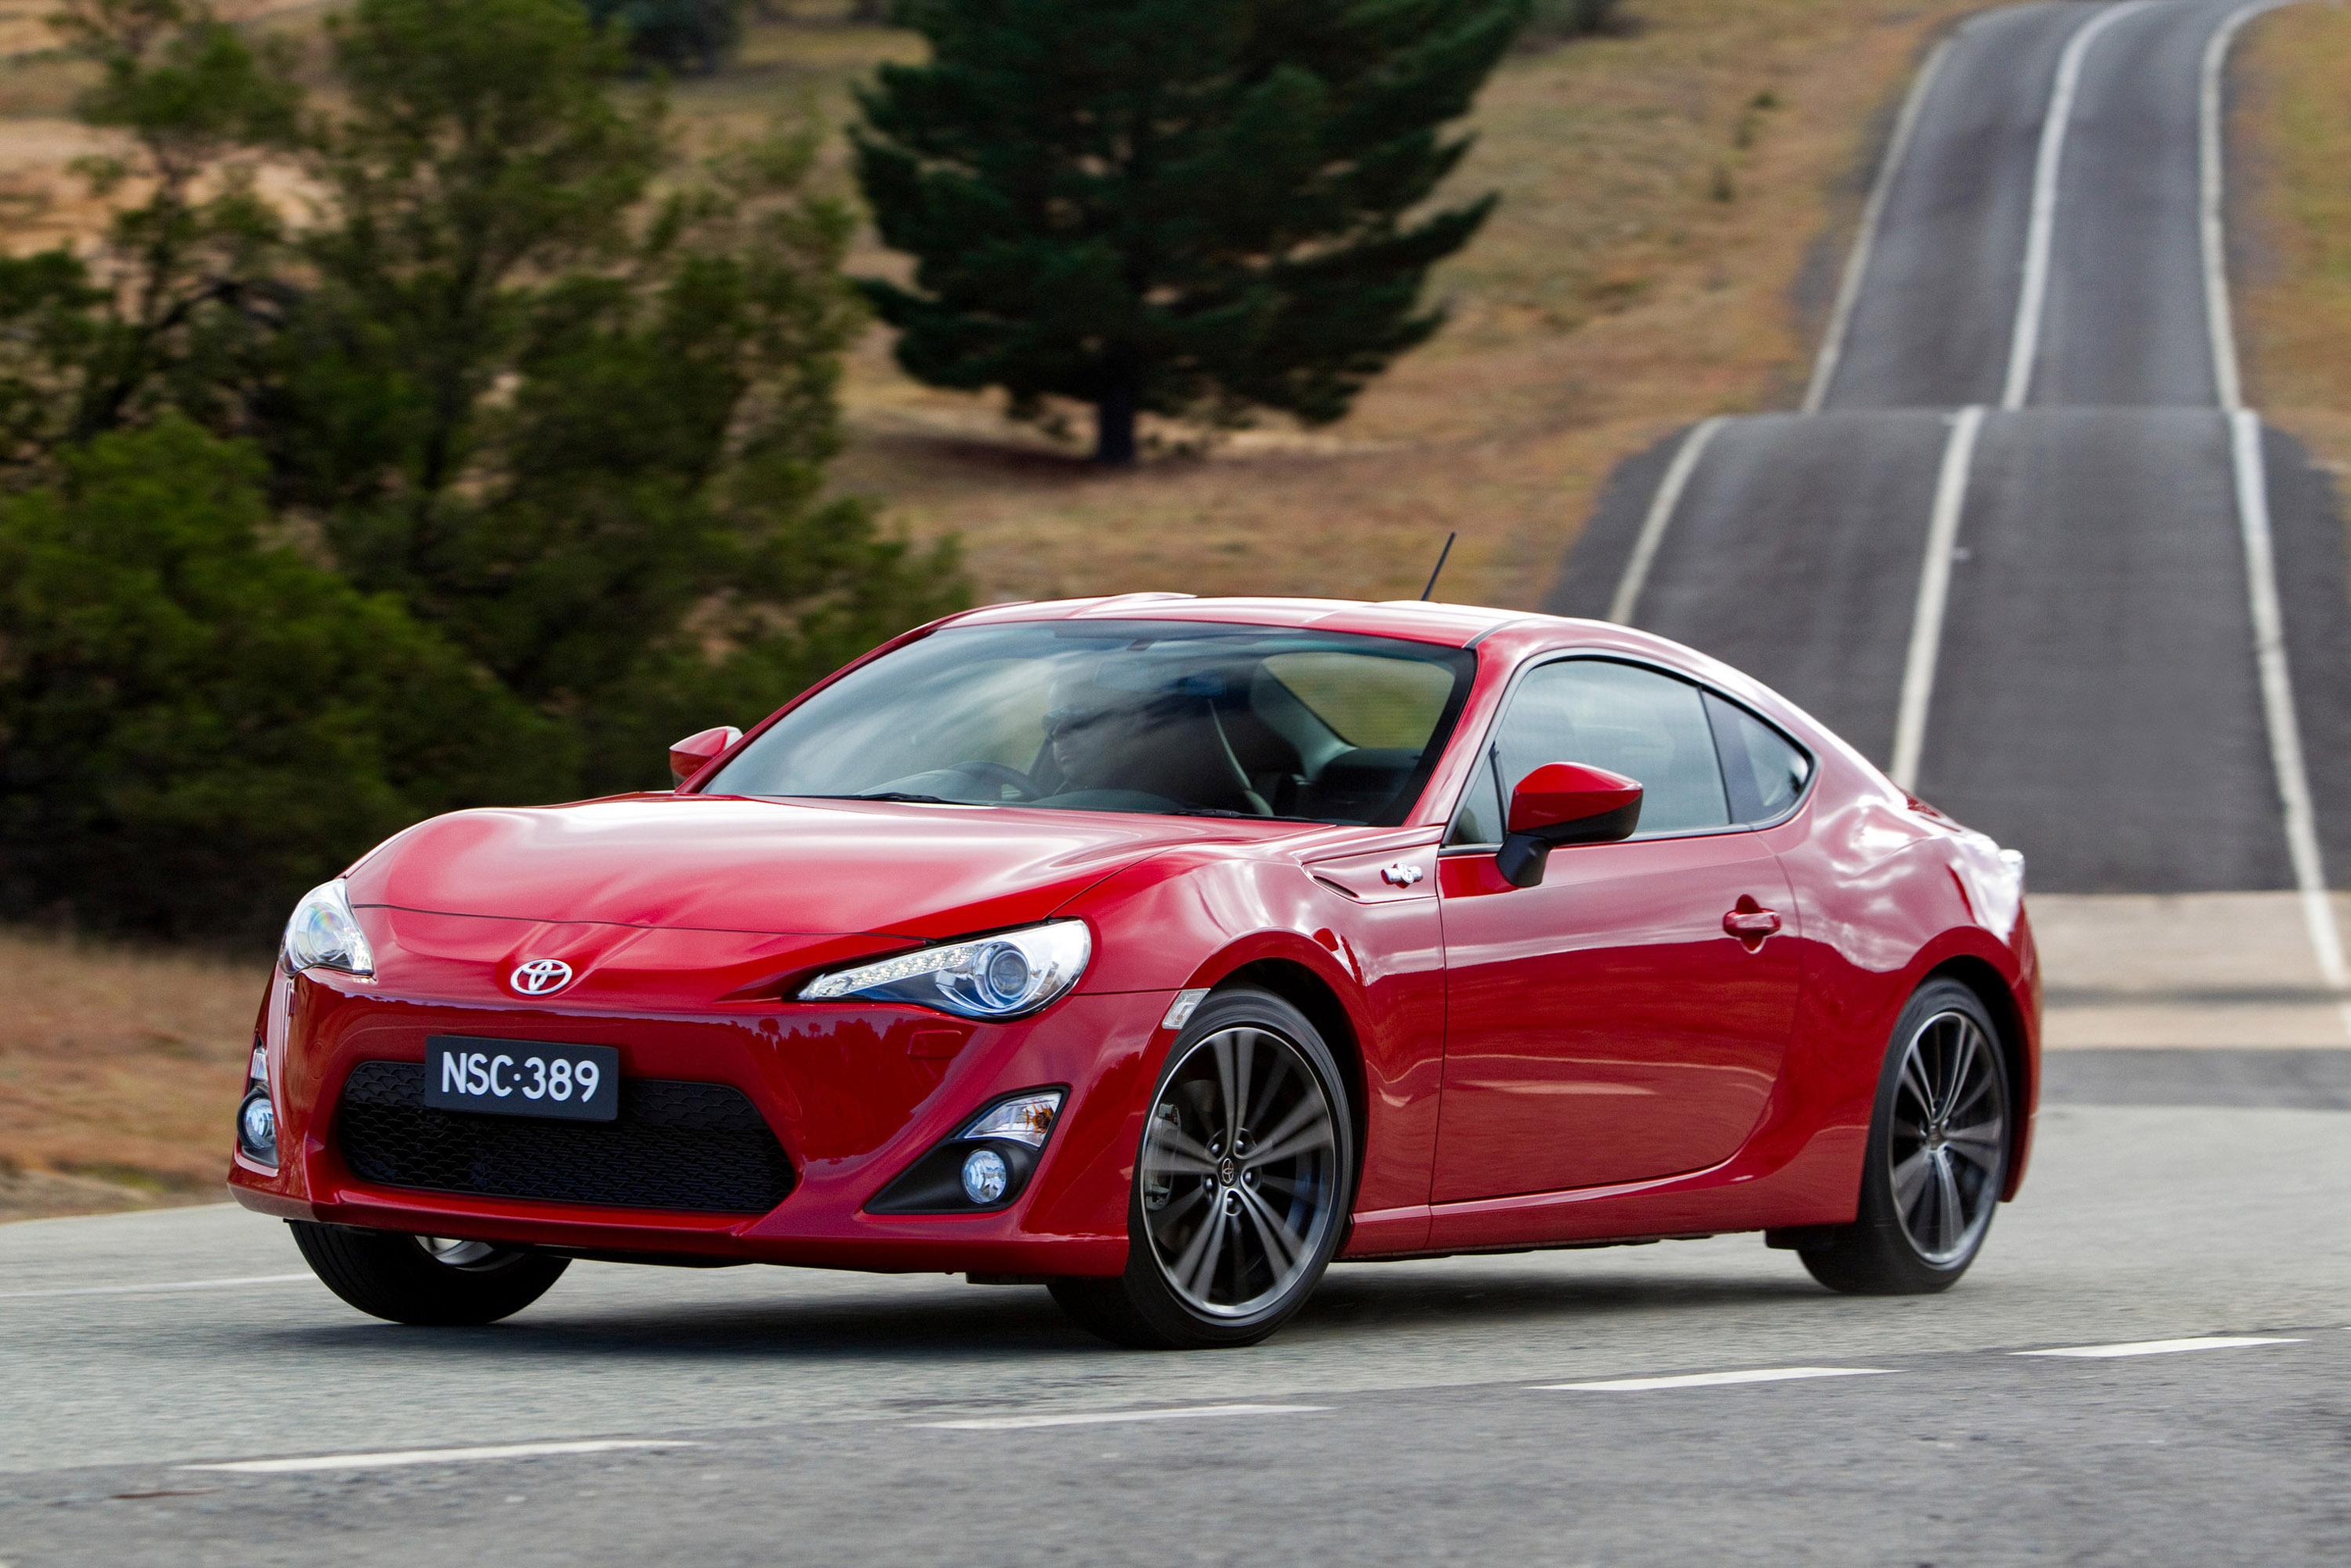 Toyota Gts on Horizontally Opposed 4 Cylinder Engine